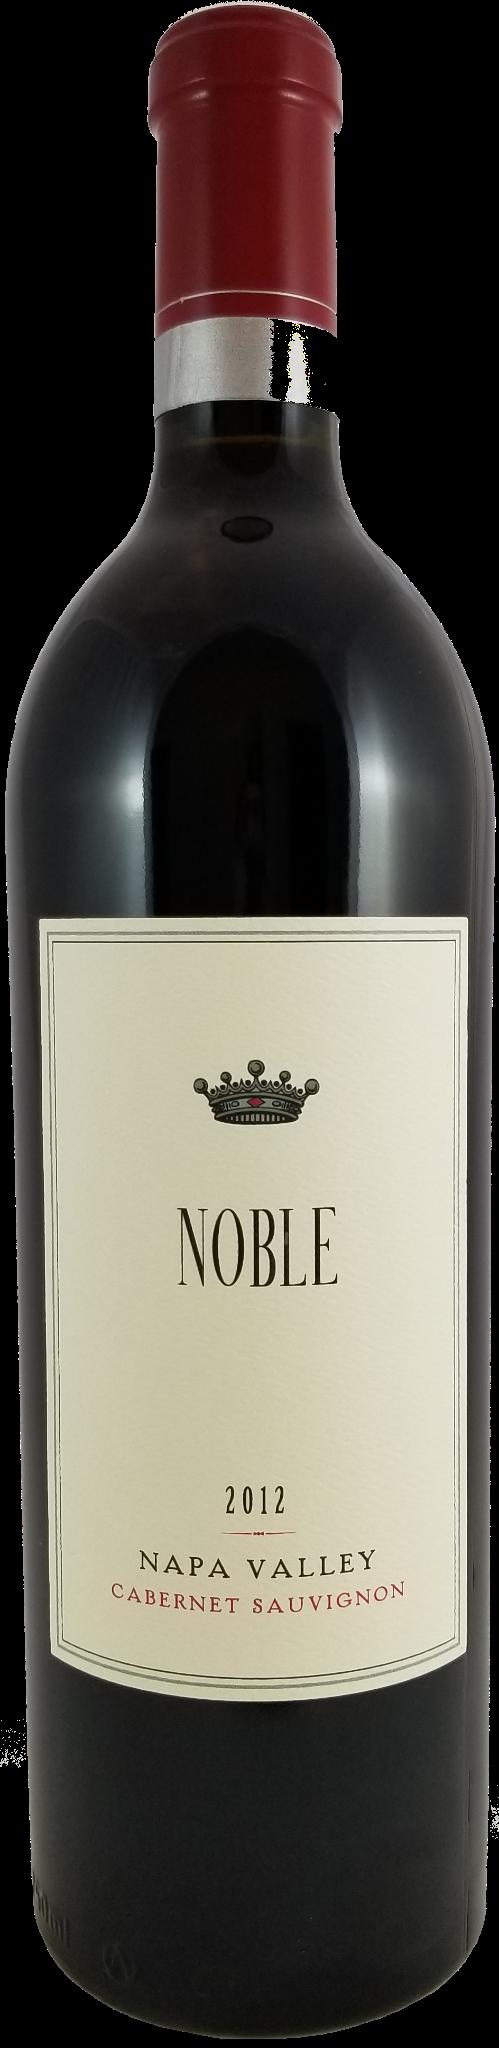 noble-2012-cabernet-sauvginon-1-1-1